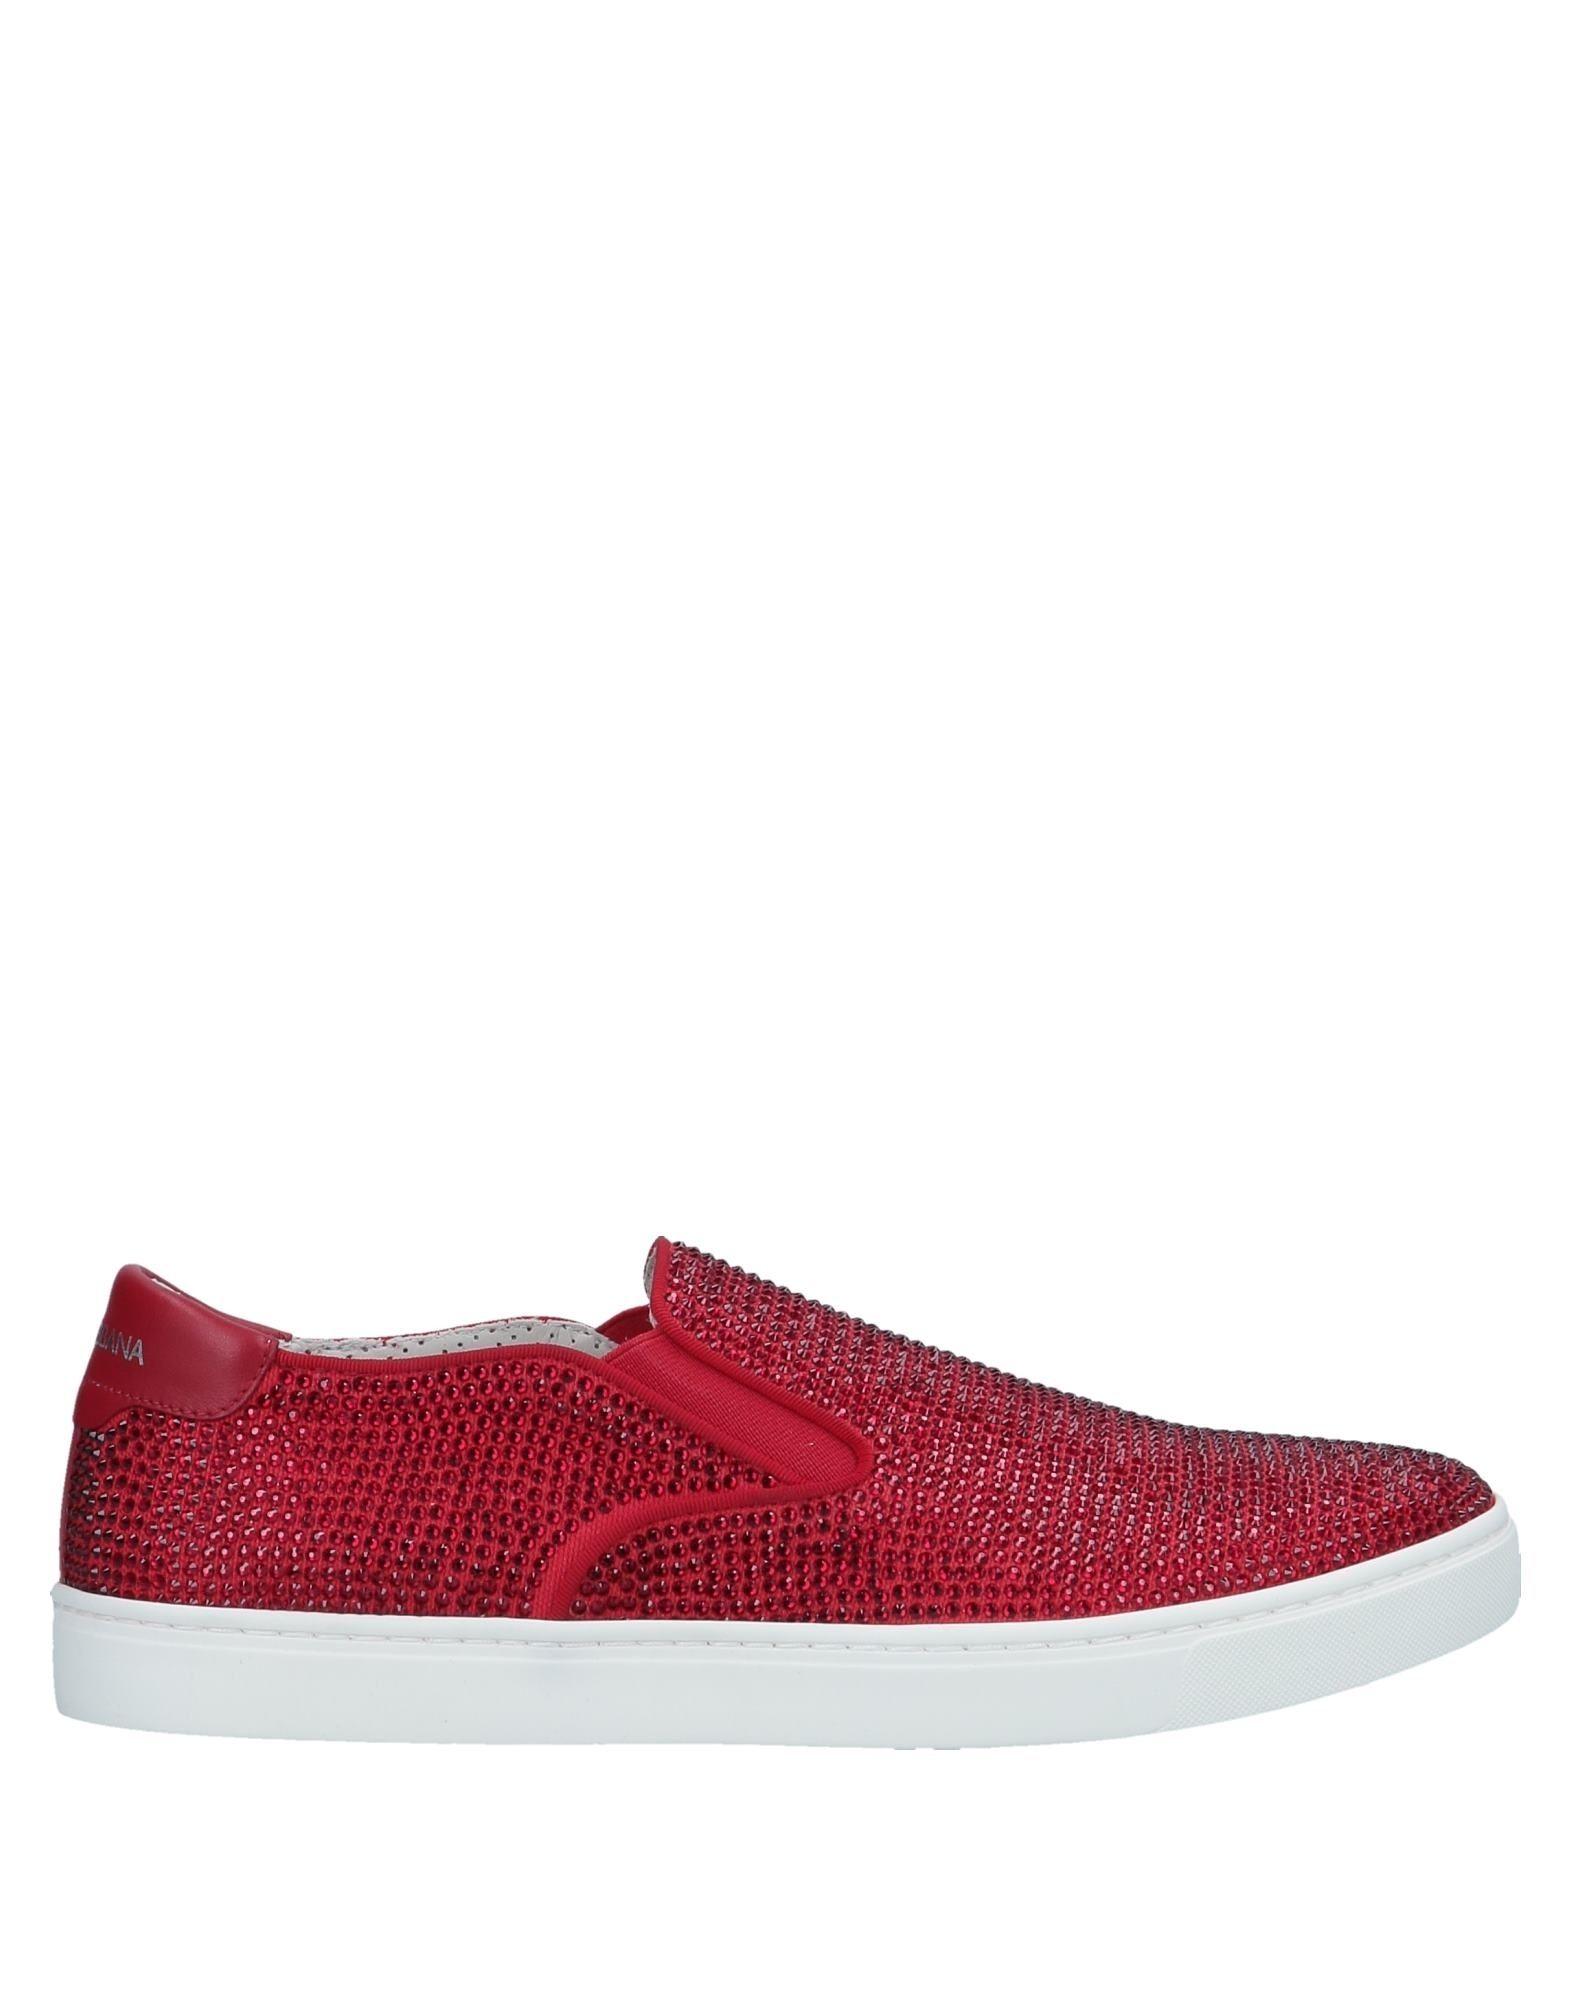 a8ead52f3 Buy sneakers for men - Best men s sneakers shop - Cools.com